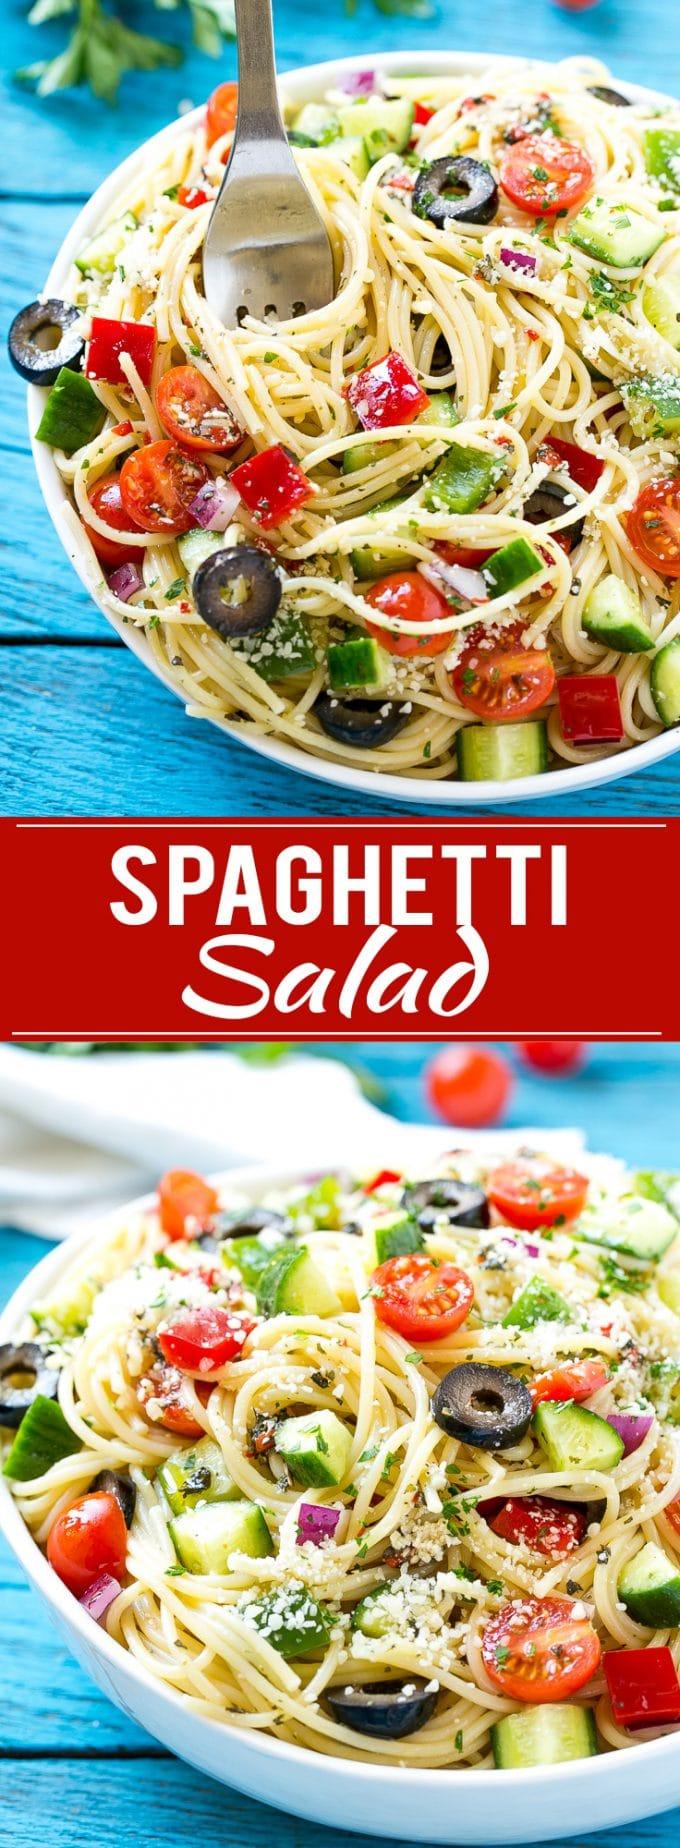 Spaghetti Salad Recipe | Pasta Salad | Potluck Recipe | Easy Pasta Salad